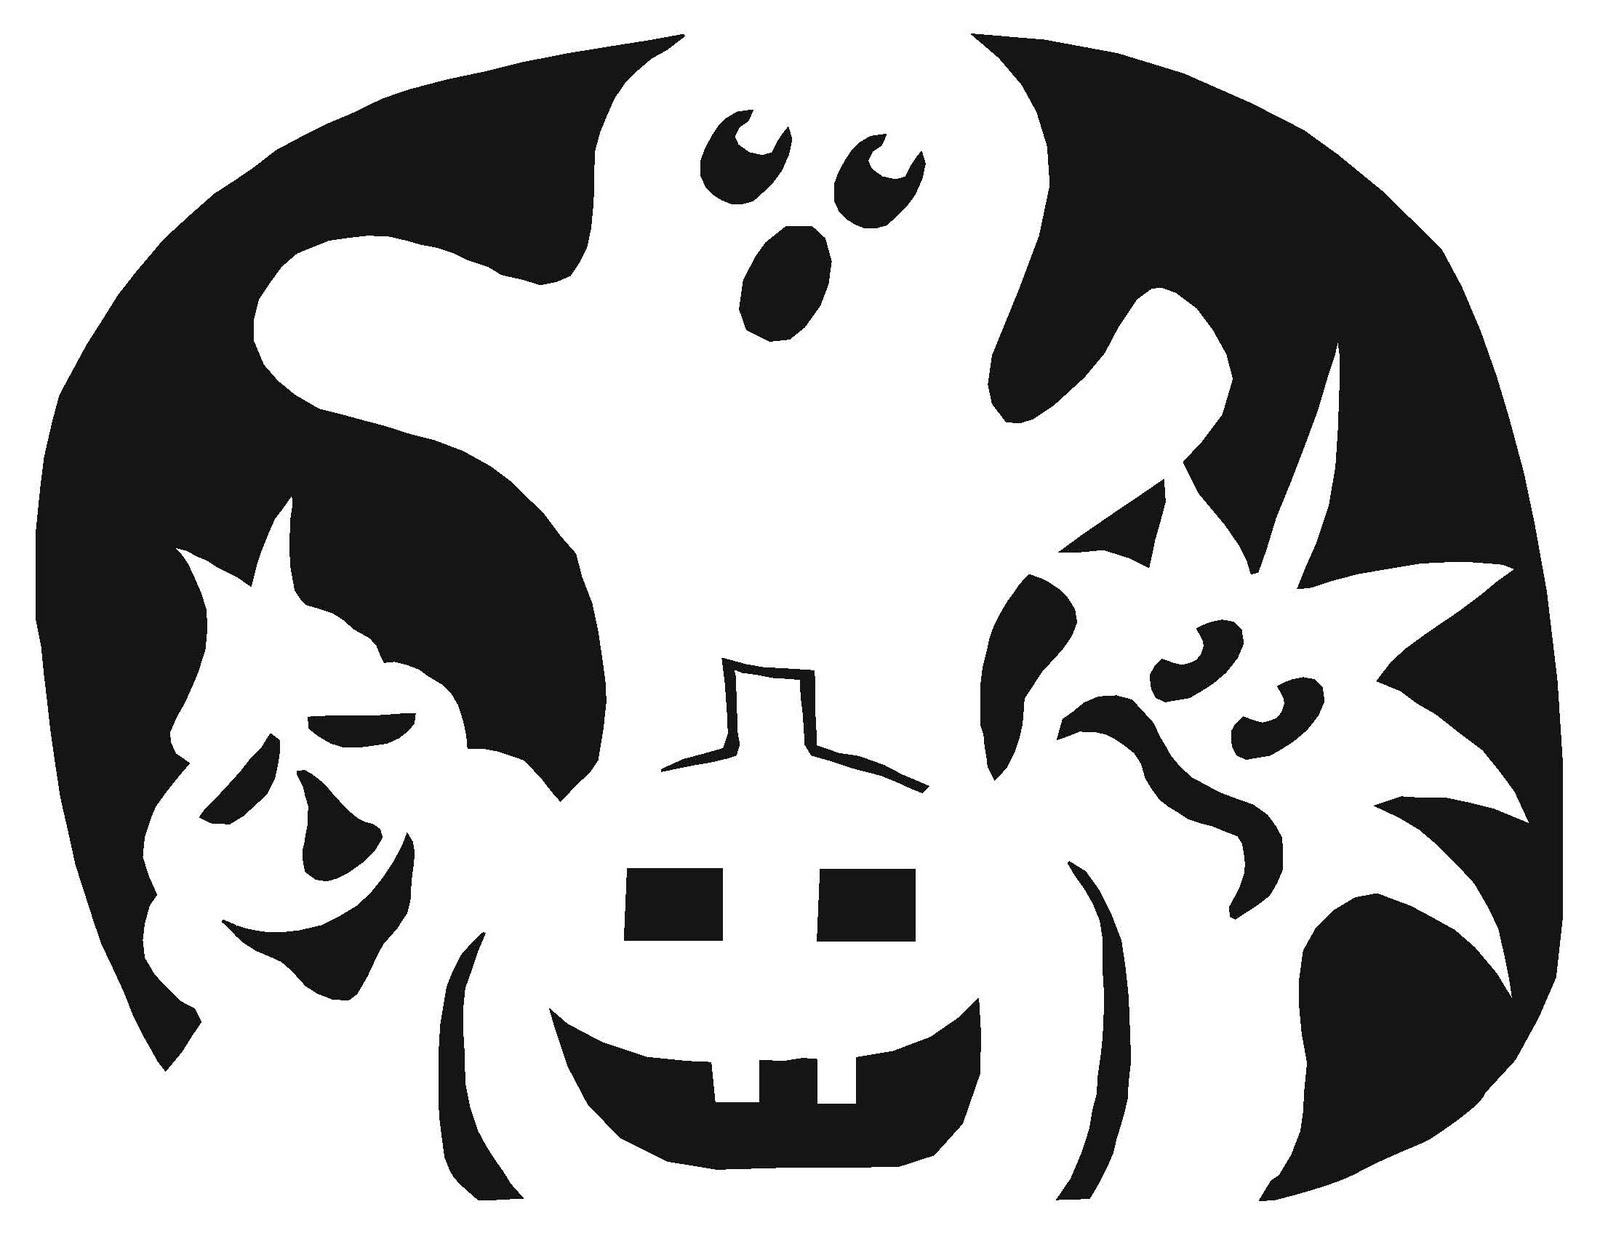 Free Guitar Pumpkin Stencil, Download Free Clip Art, Free Clip Art - Free Printable Pumpkin Stencil